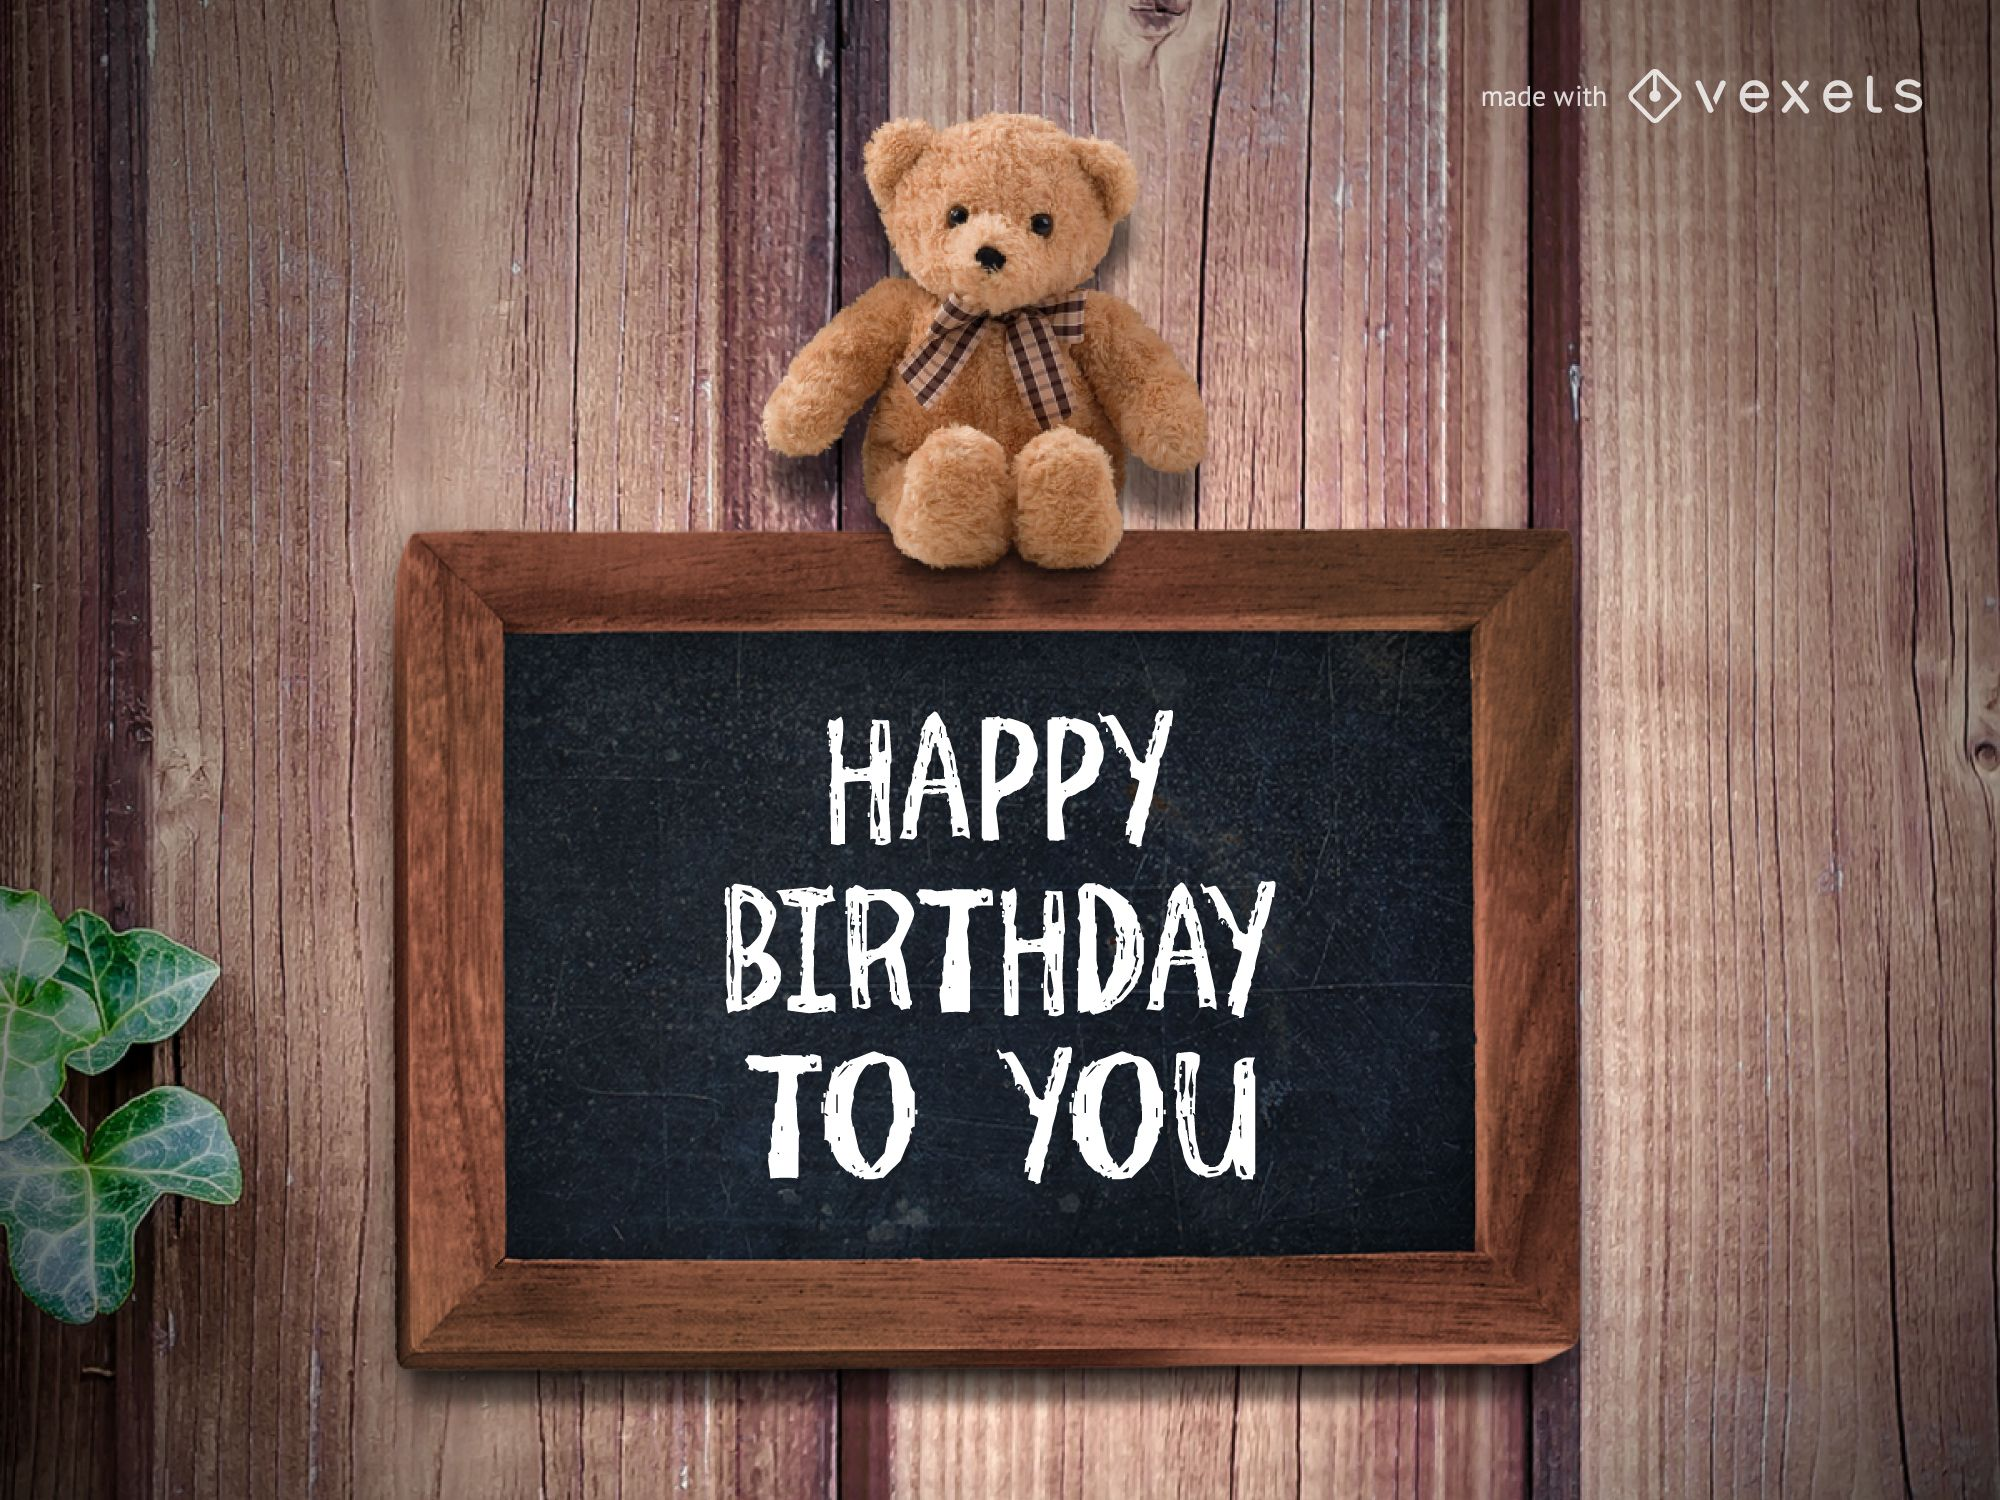 Happy birthday greeting maker editable design happy birthday greeting maker download large image 2000x1500px m4hsunfo